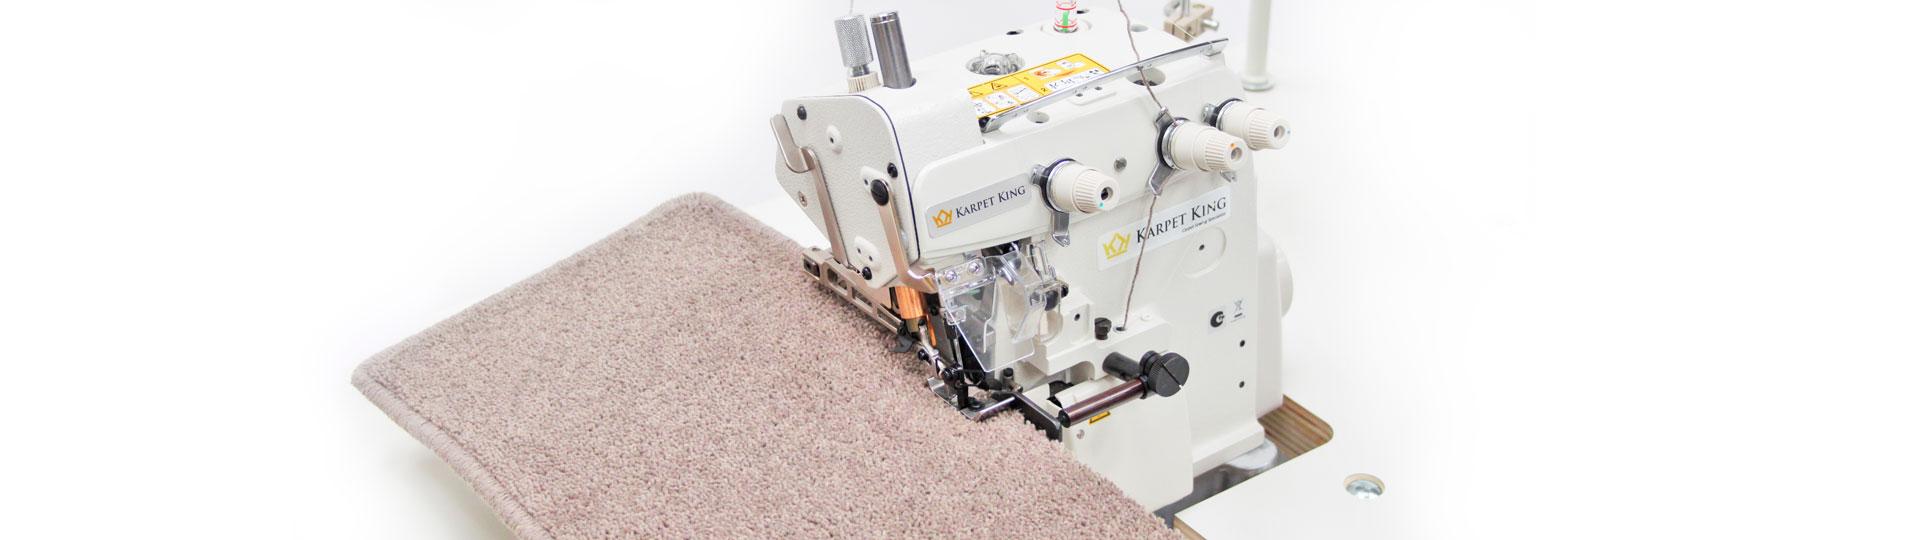 712-P- carpet sample sewing machine